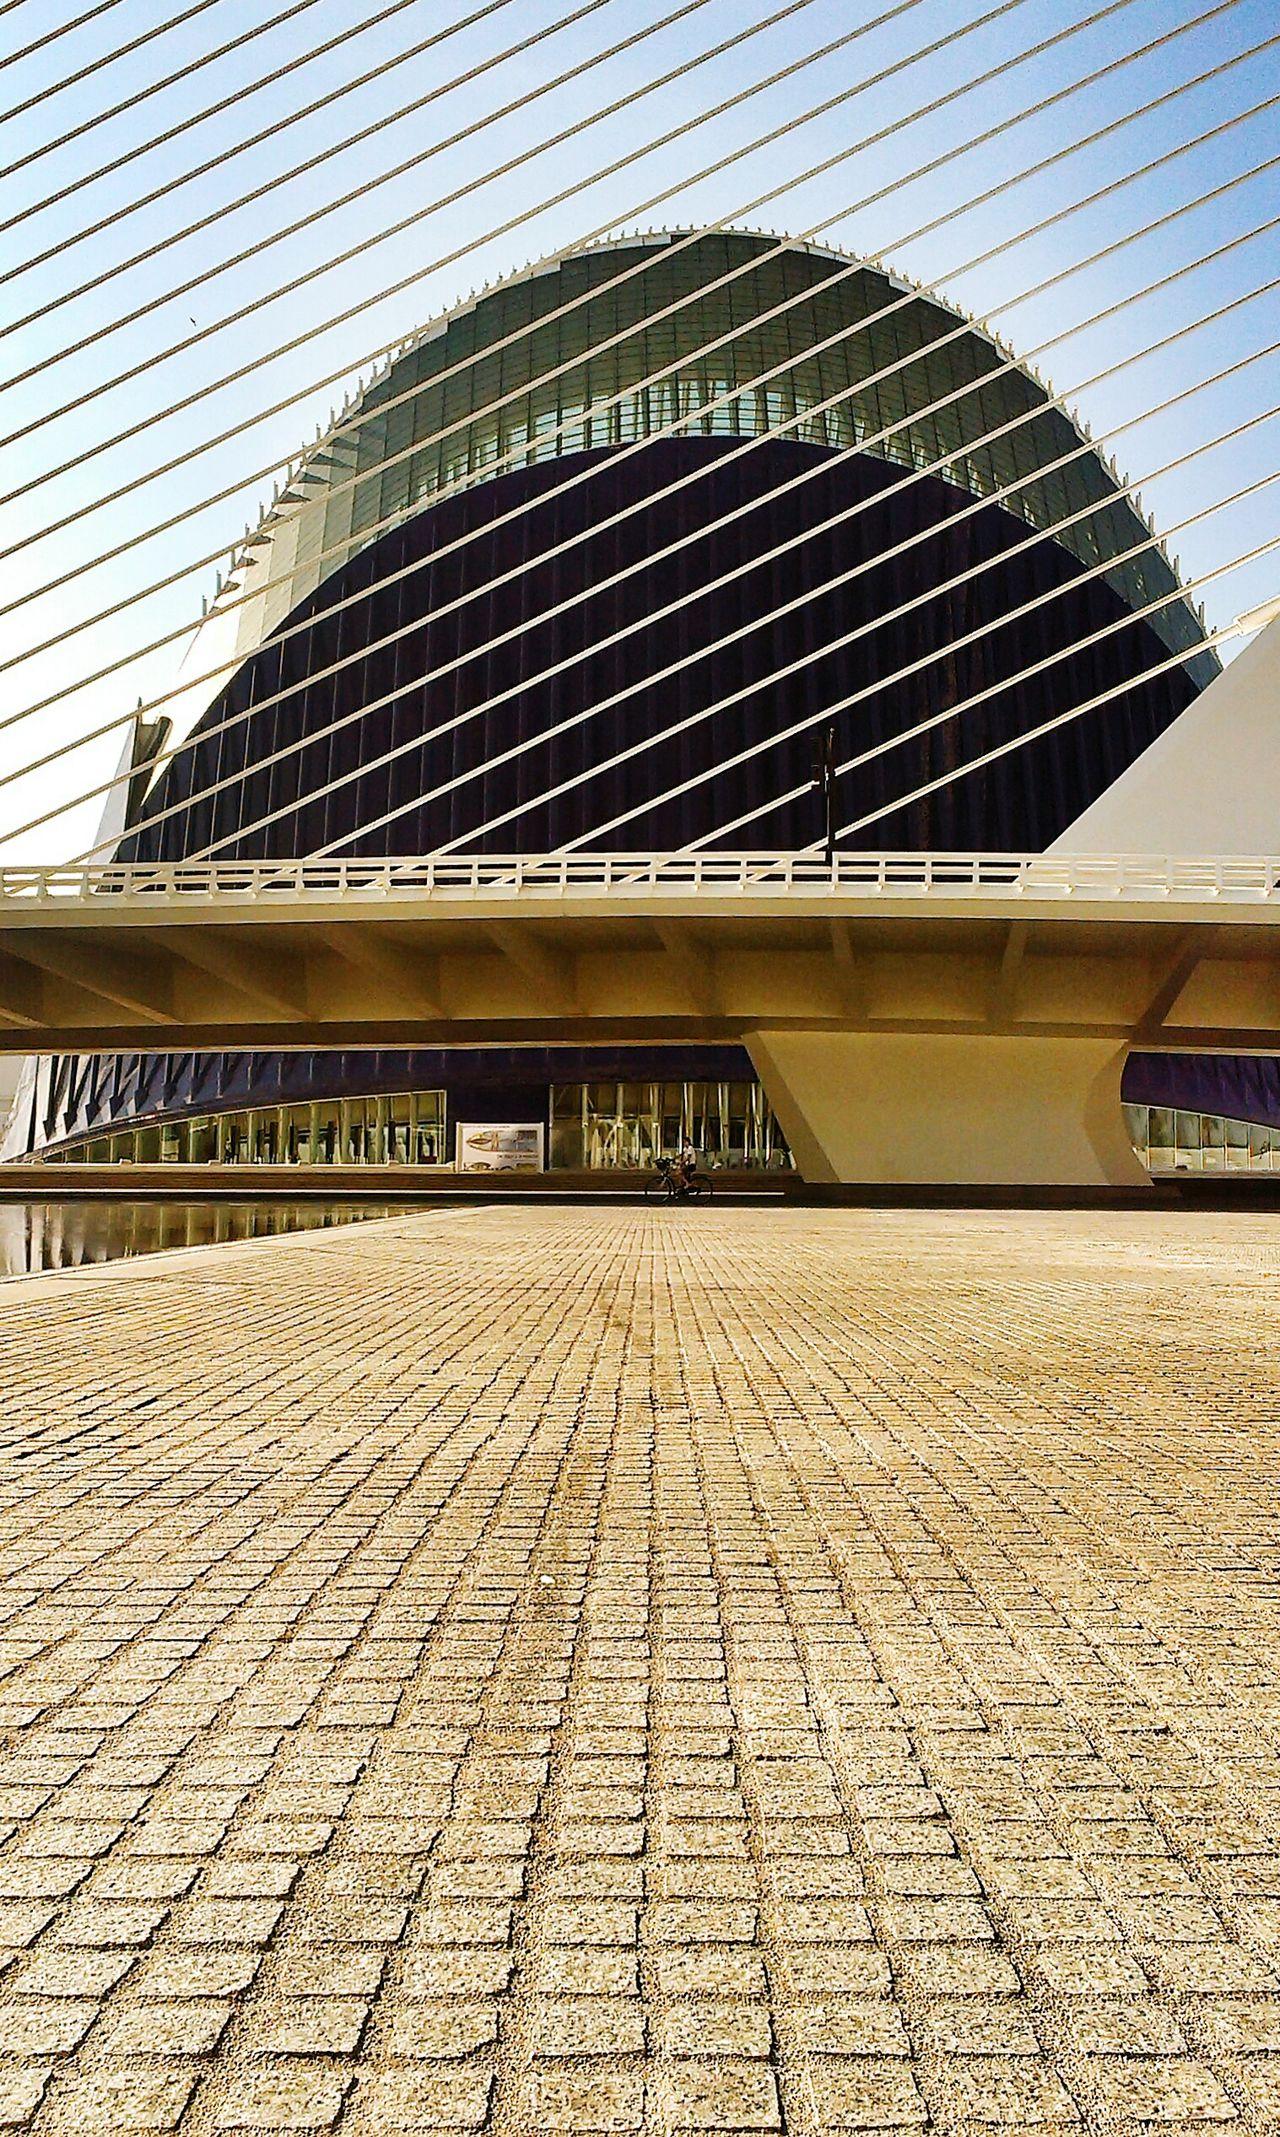 The Architect - 2015 EyeEm Awards Architecture Amazing Architecture EyeEm Gallery Architecture_collection EyeEm Best Edits EyeEm Best Shots EyeEm Best Shots - Architecture Valencia, Spain